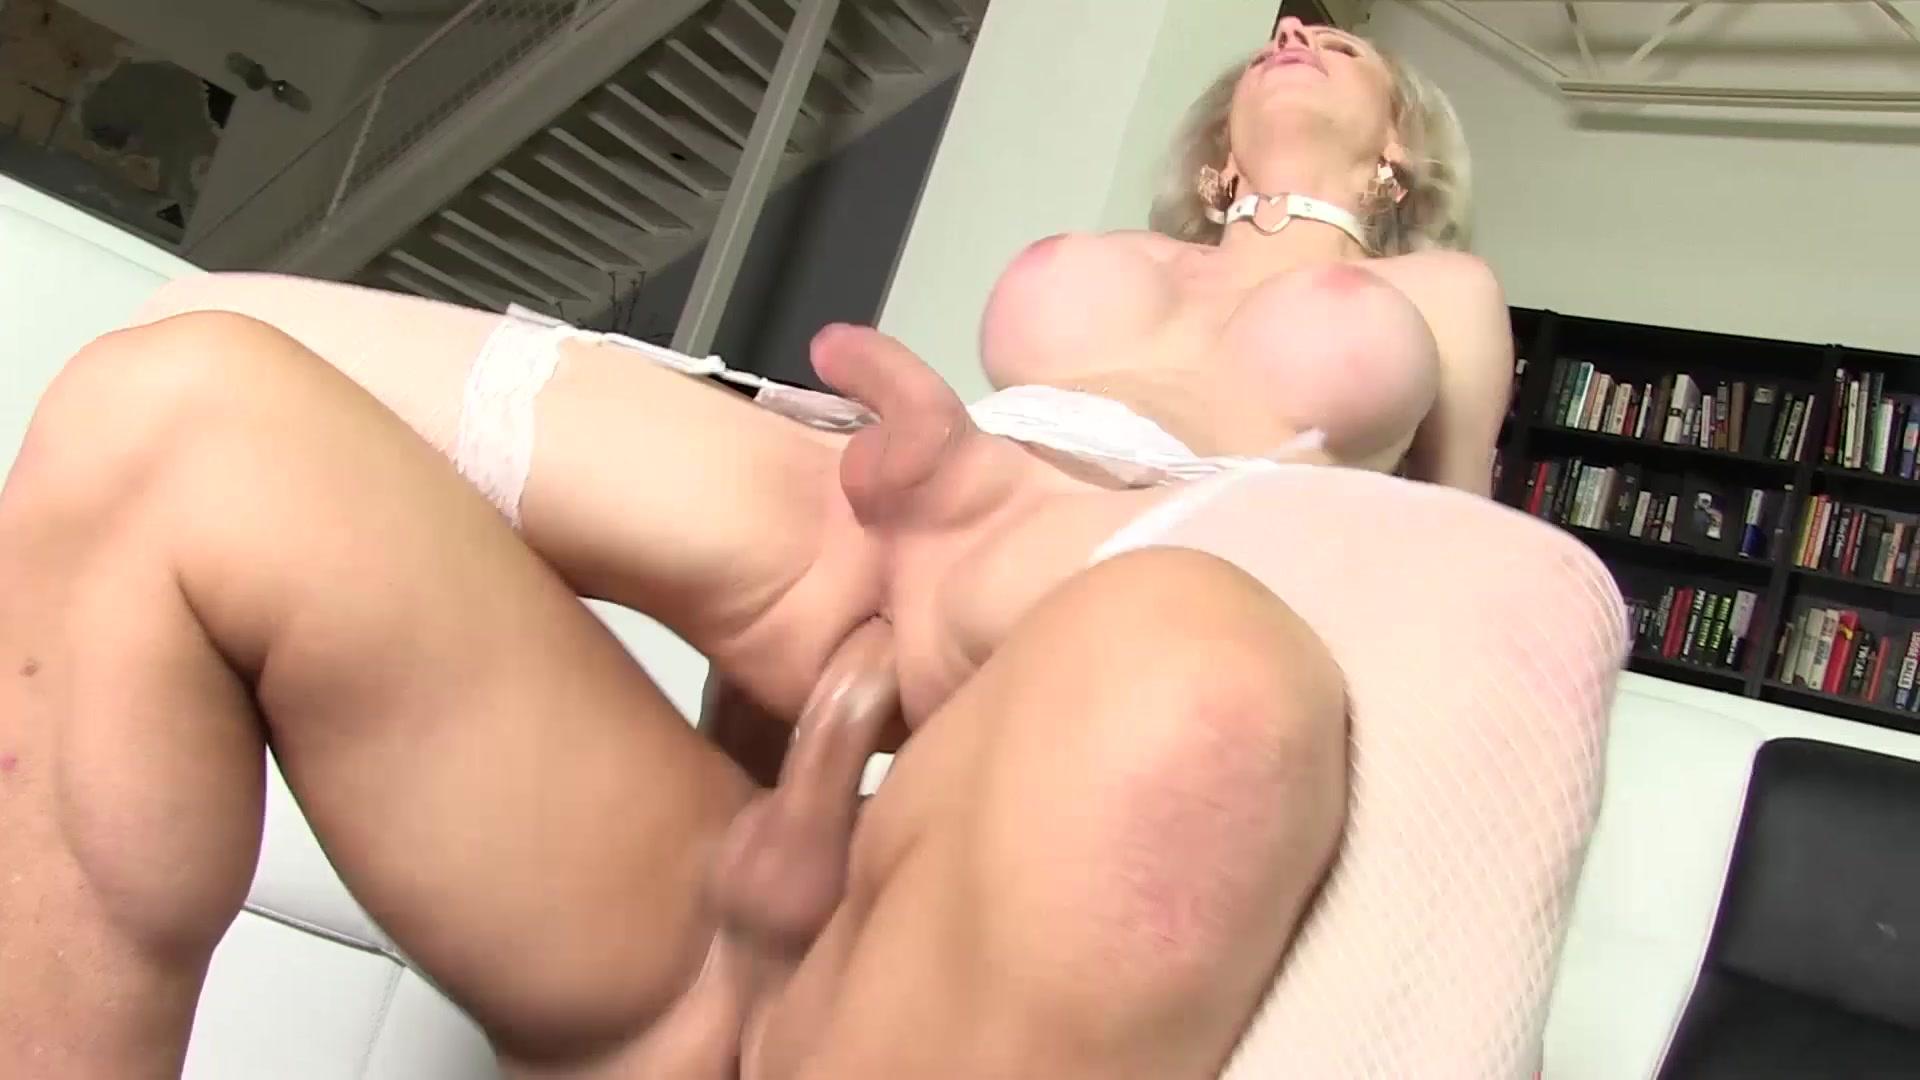 Nude men Transvestite latex 2007 jelsoft enterprises ltd